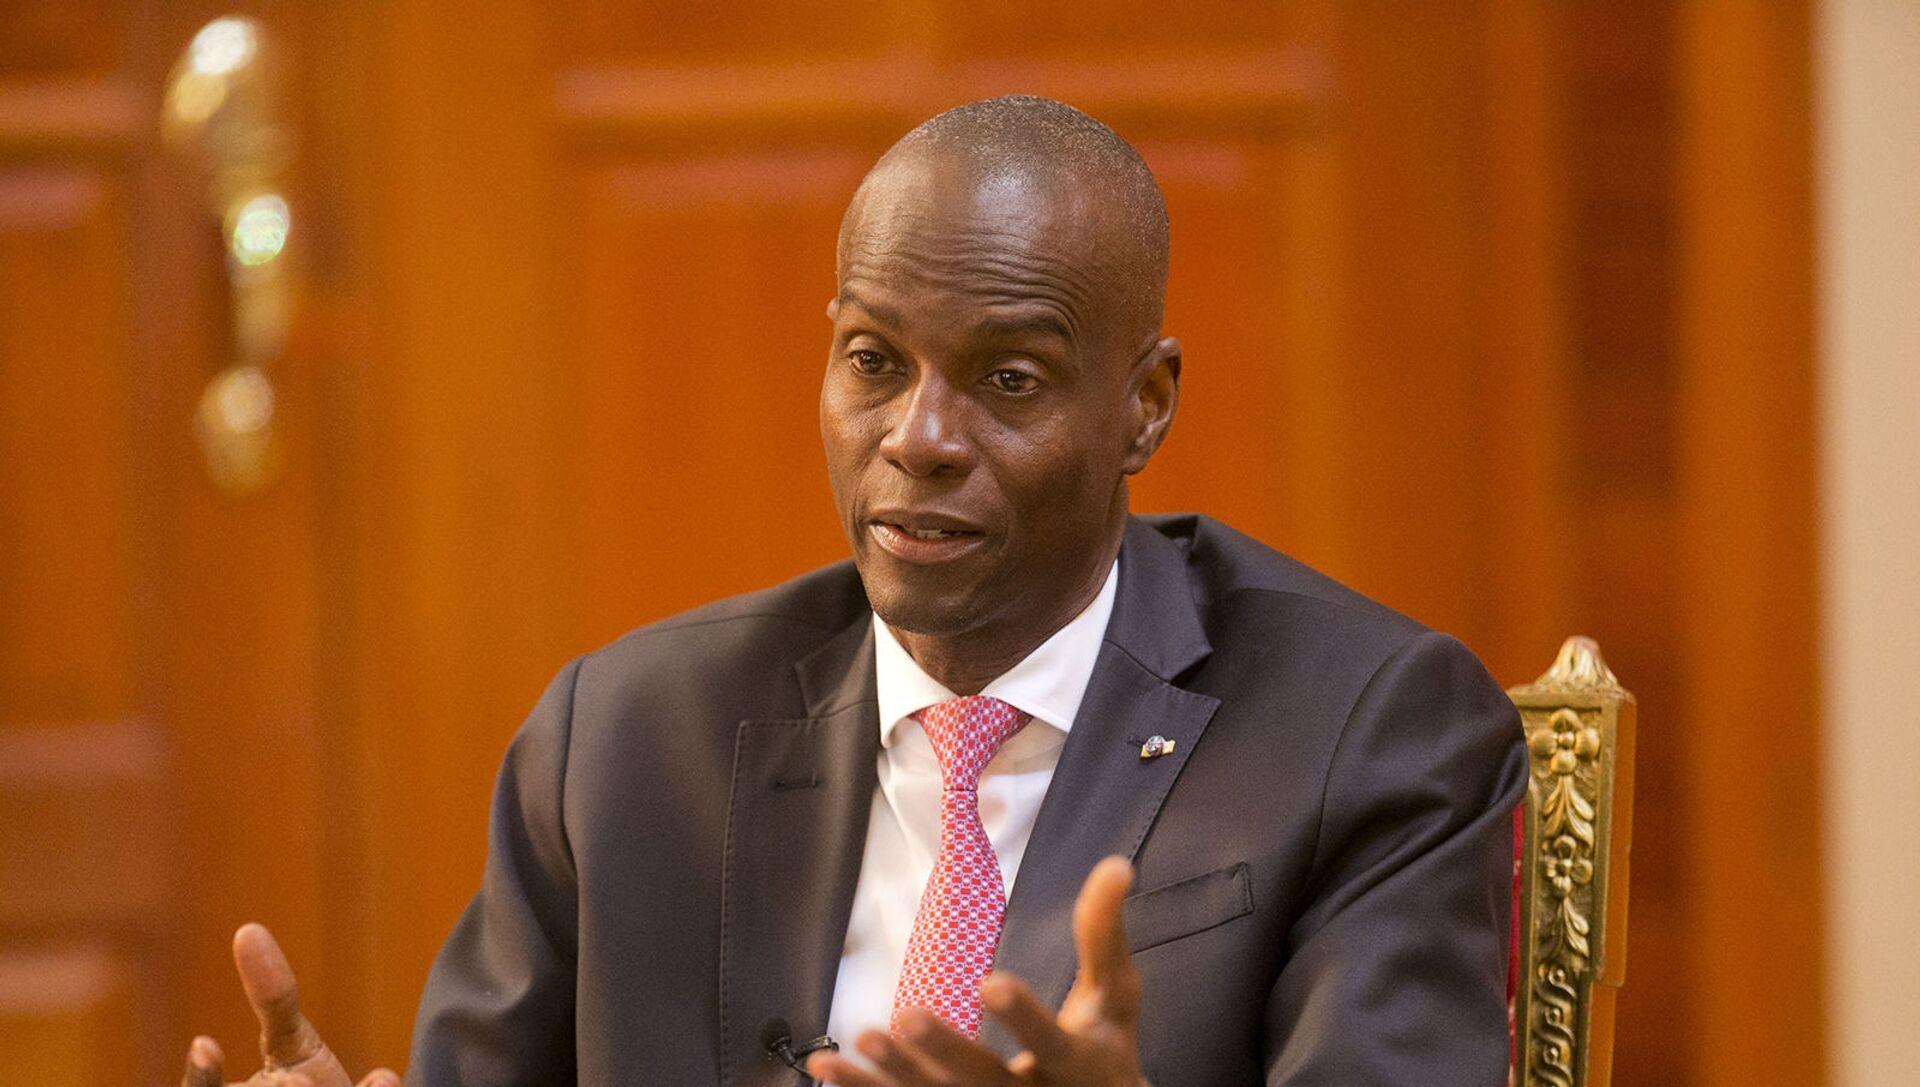 Президент Гаити Жовенель Моисса - Sputnik Արմենիա, 1920, 07.07.2021